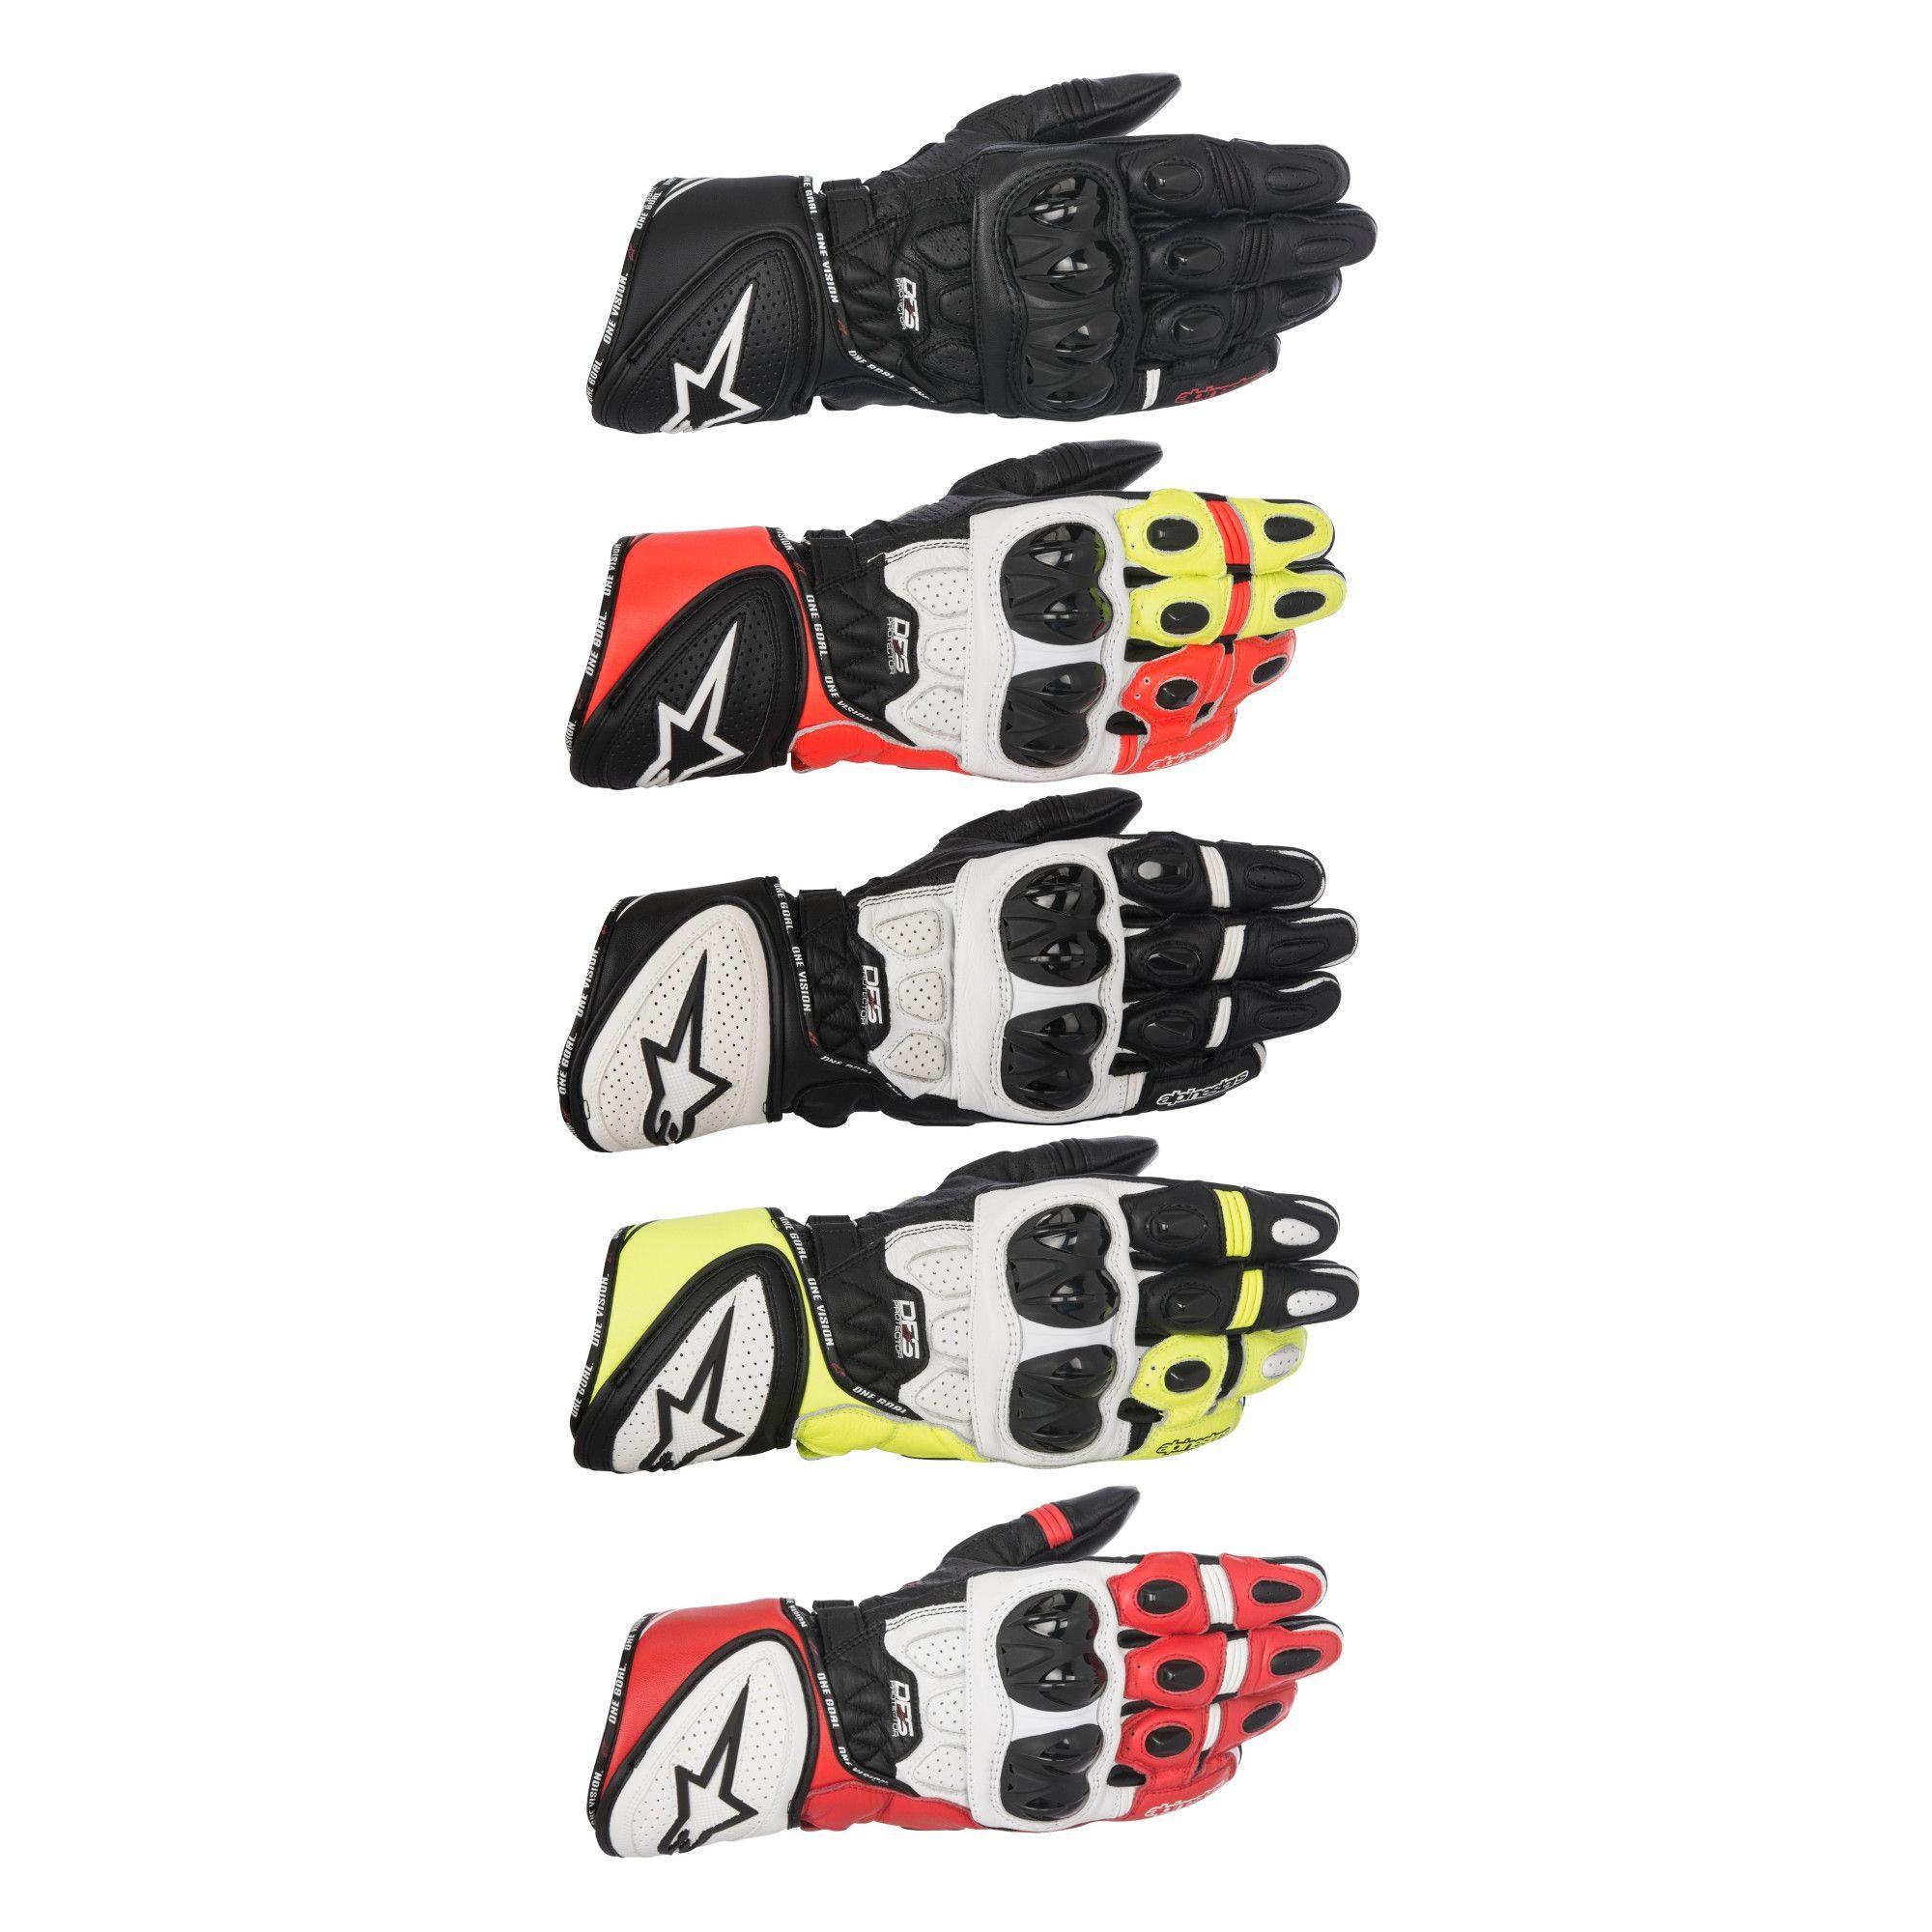 Gp Plus R Leather Motorcycle Gloves Ebay